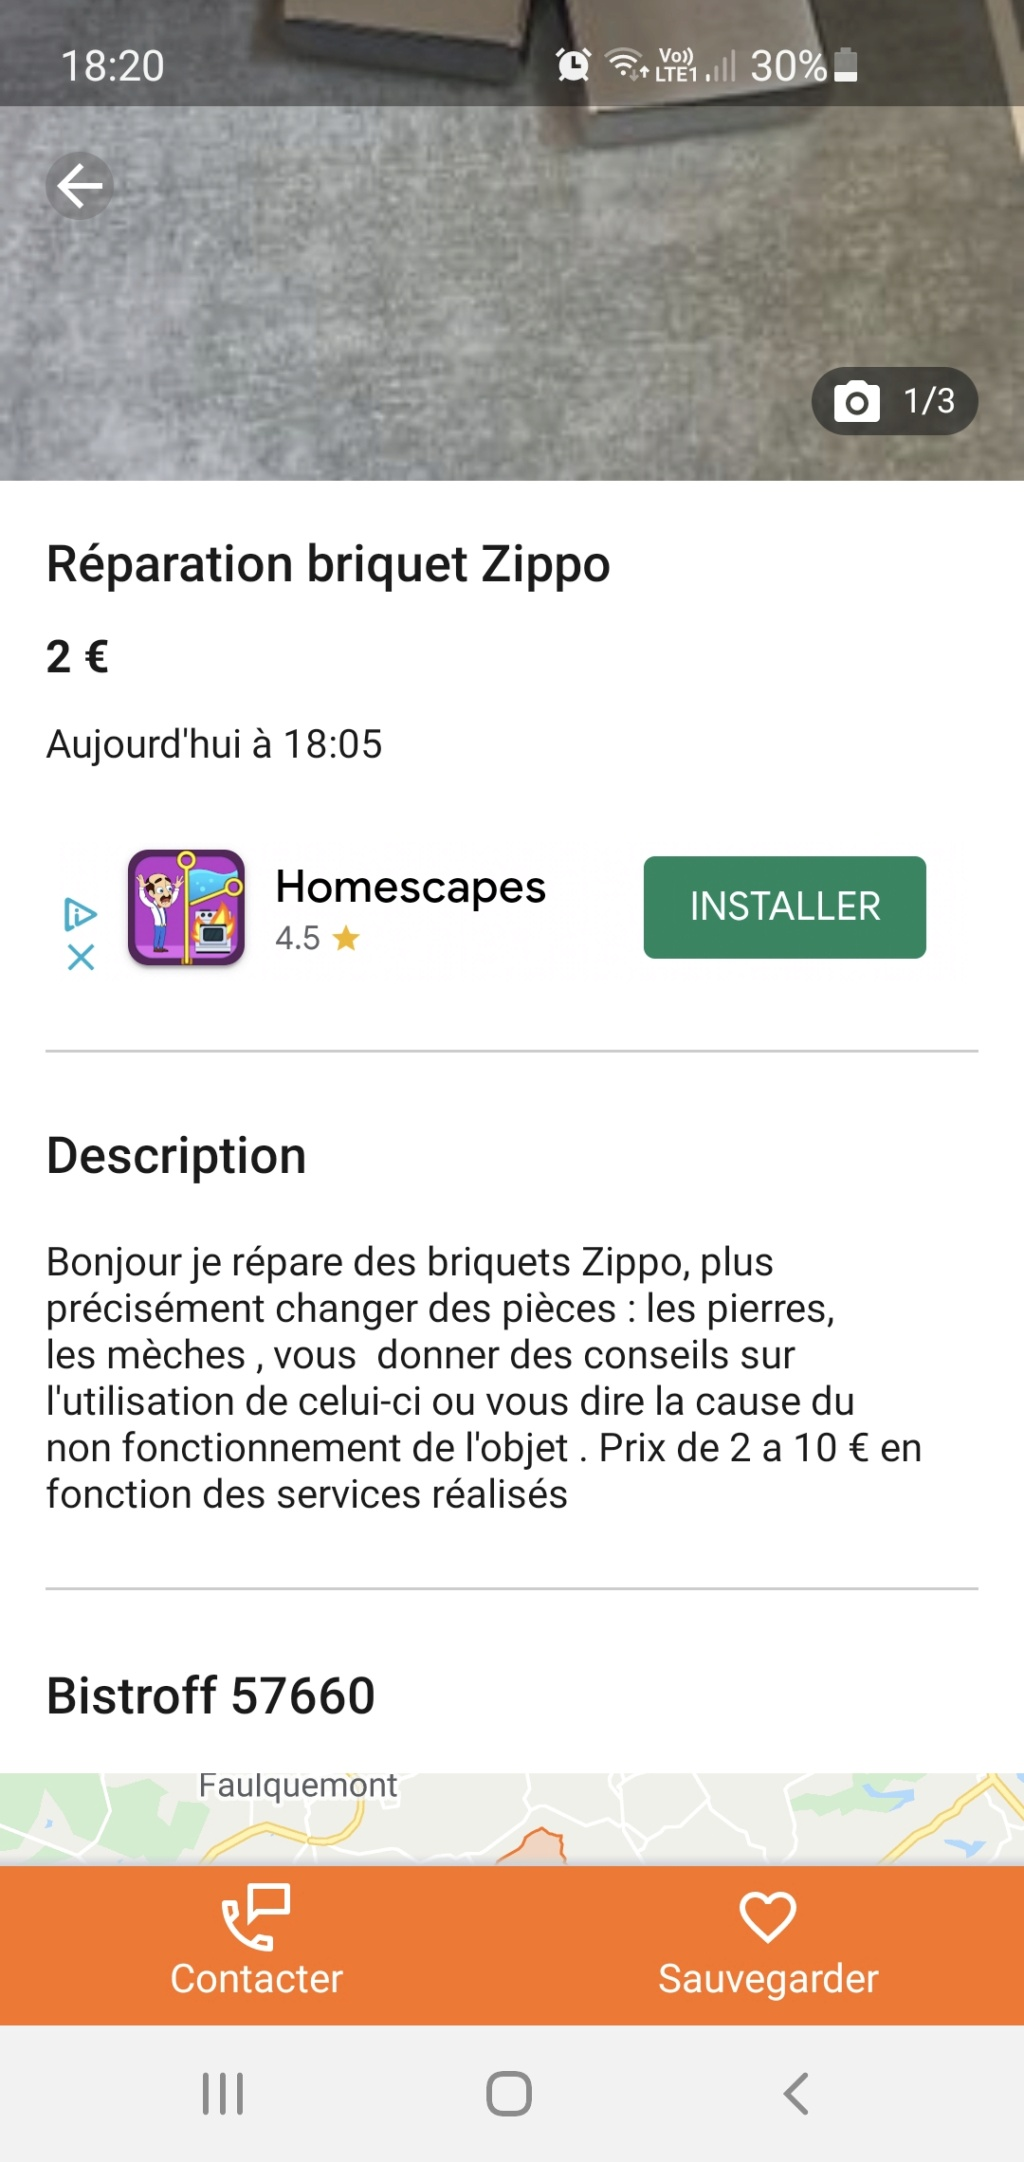 Zippo sur Le Bon Coin (2éme tome) - Page 39 Screen29